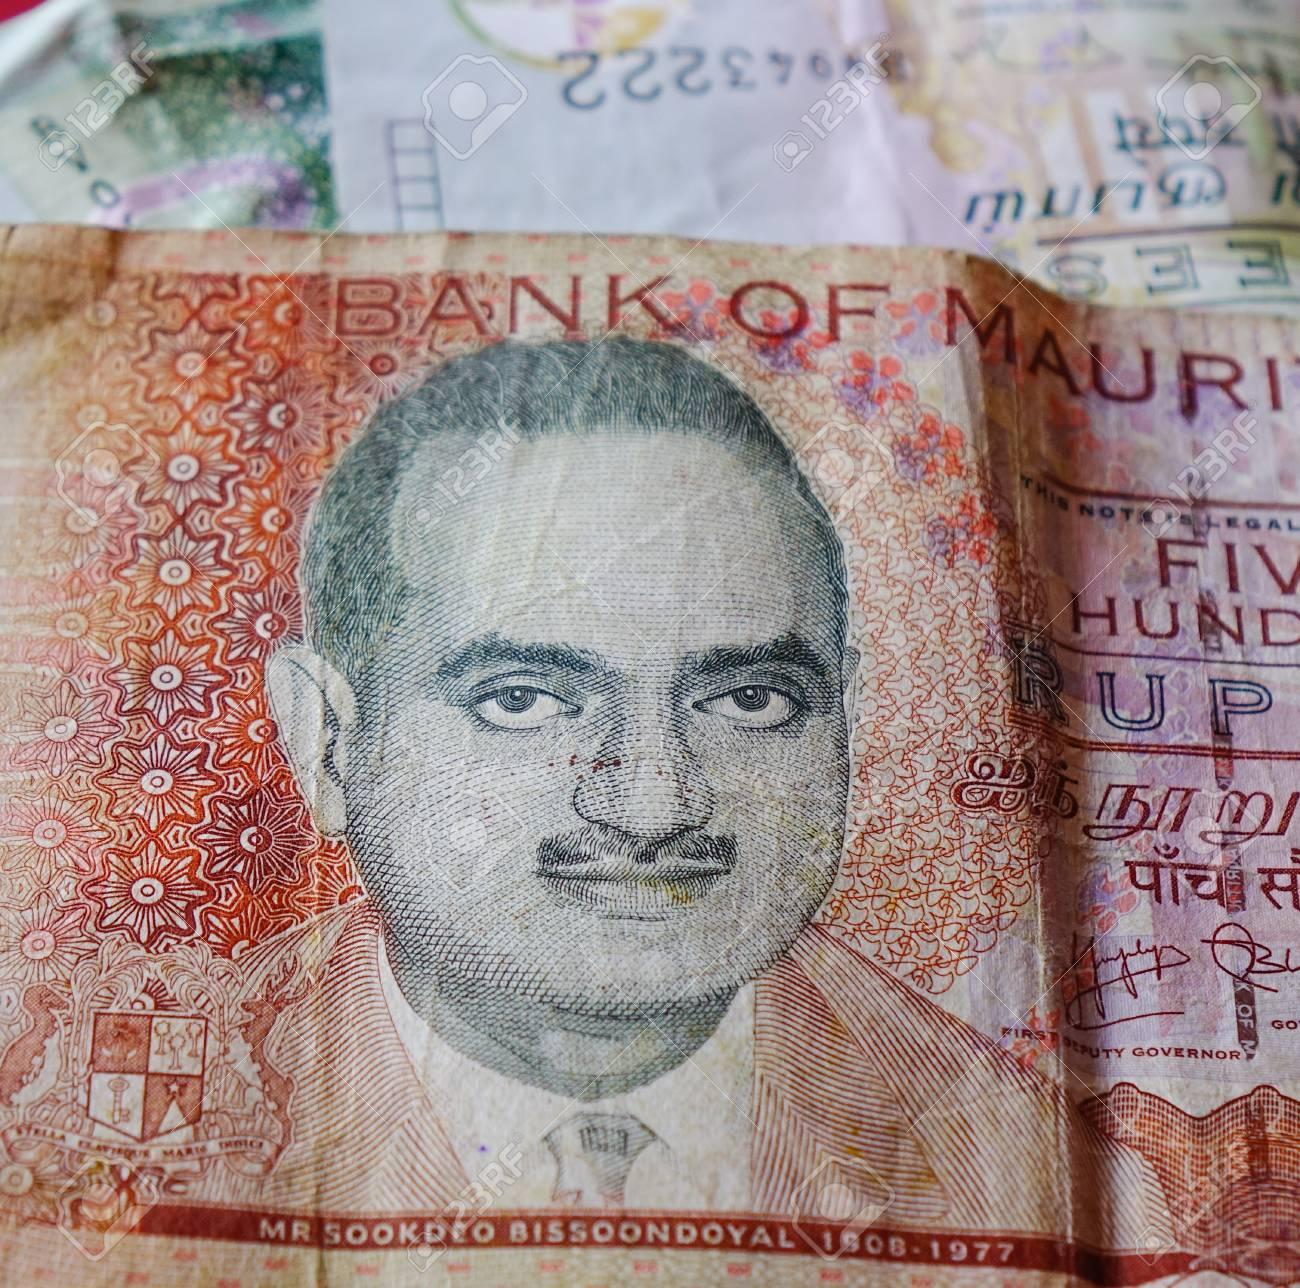 Mauritius Rupee Mur Billnotes With Portrait Money Background